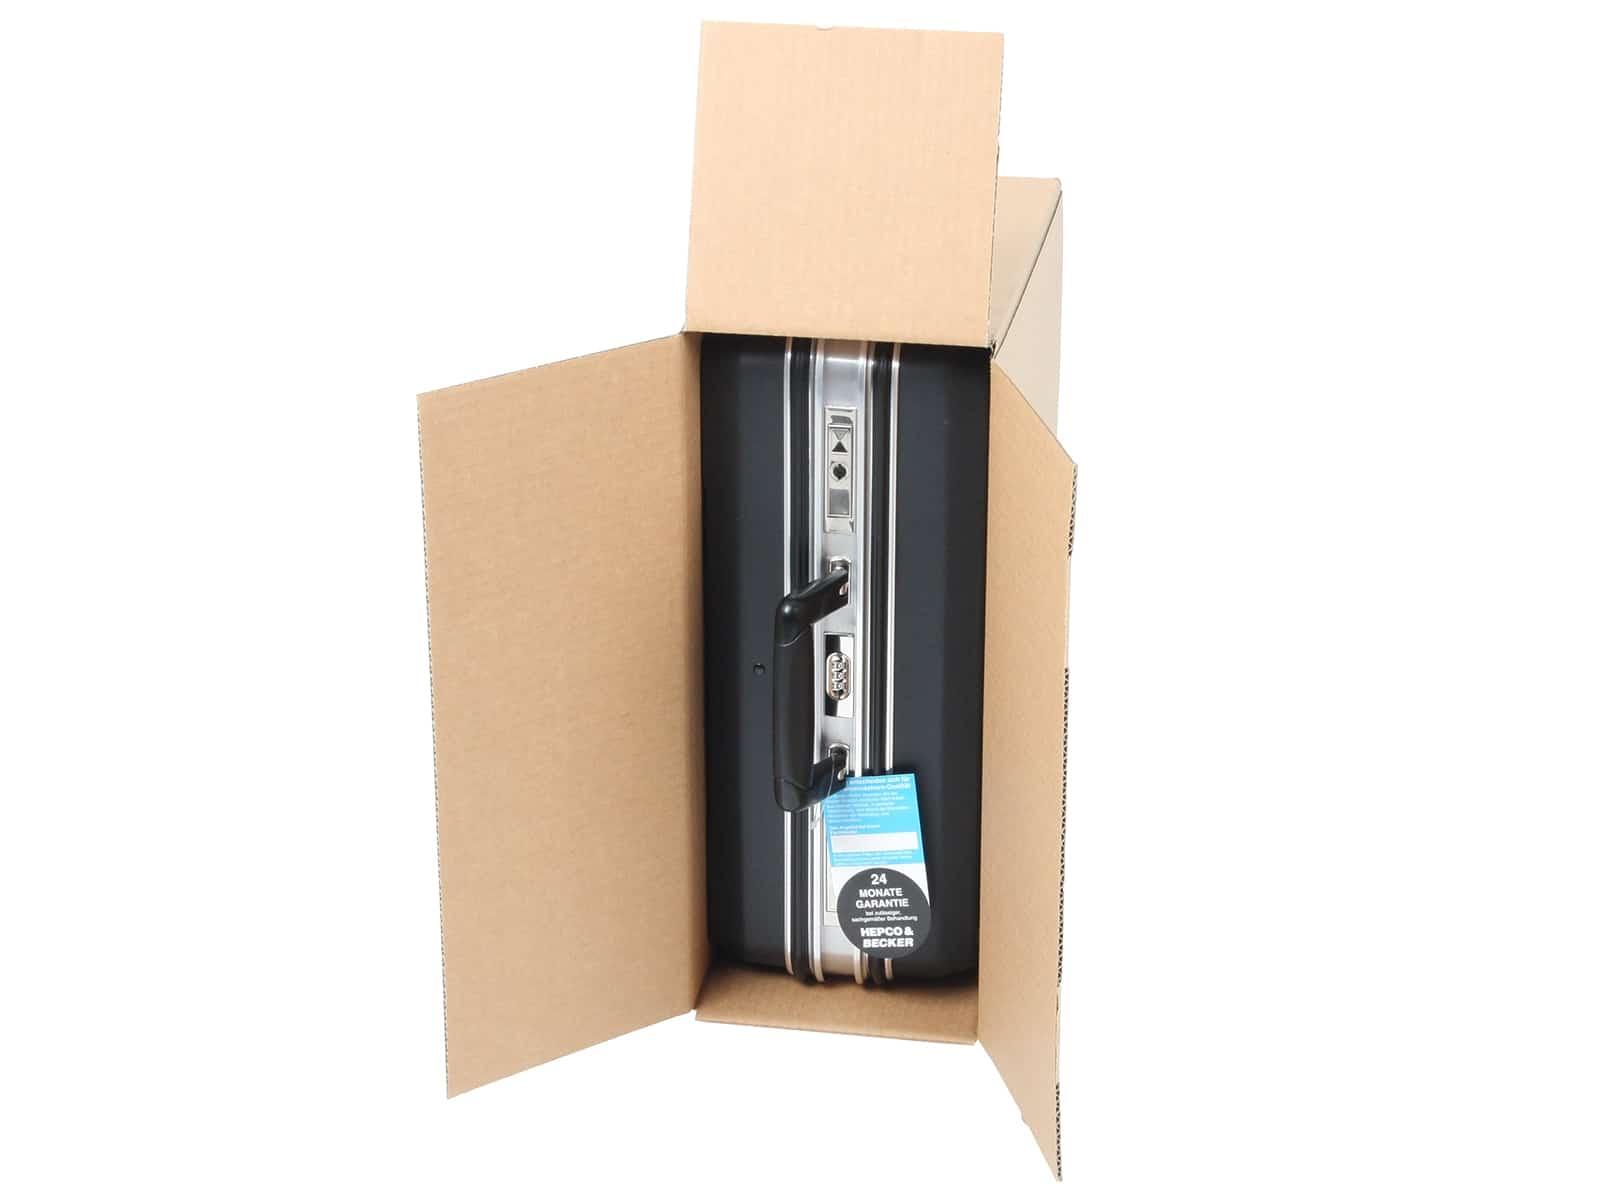 Werkzeugkoffer Budget 25 ltr. L2 5022